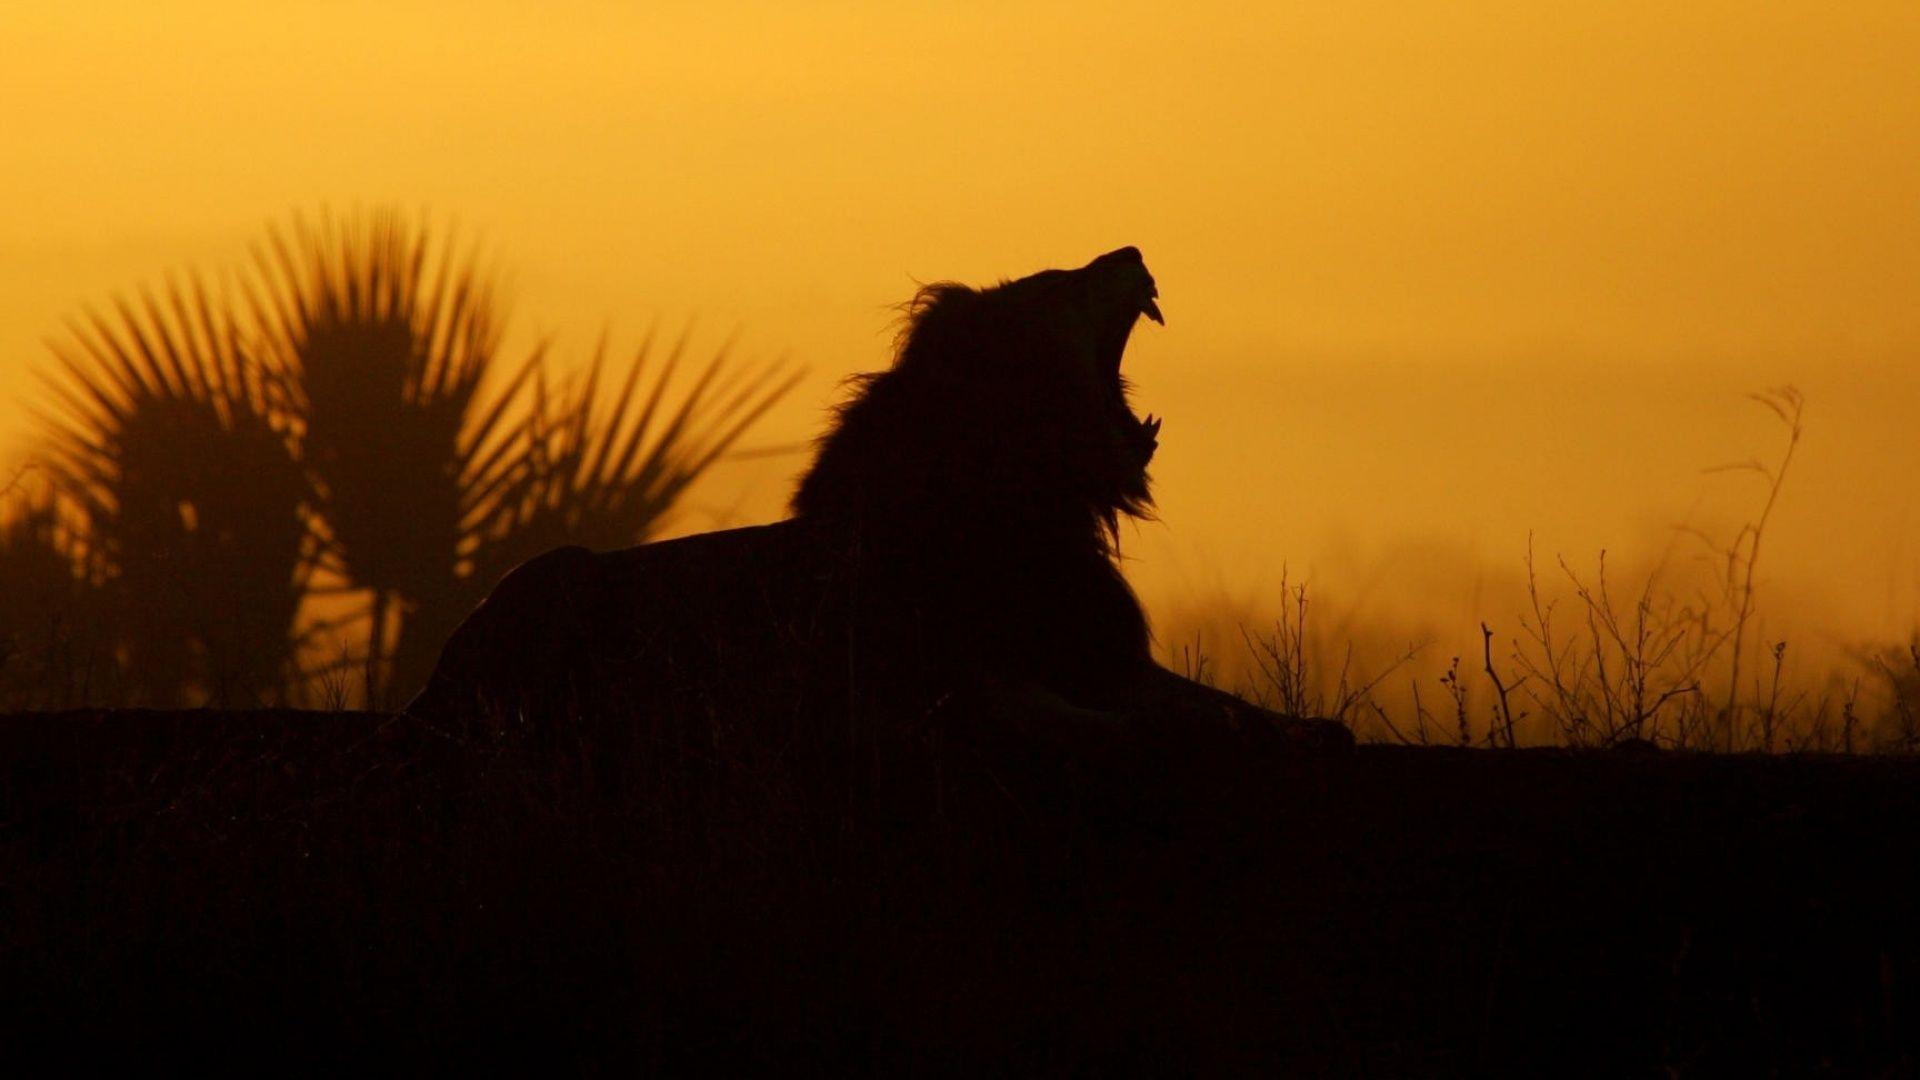 Hd wallpaper lion - Yawning Lion Sunrise Hd Wallpaper 1080p Free